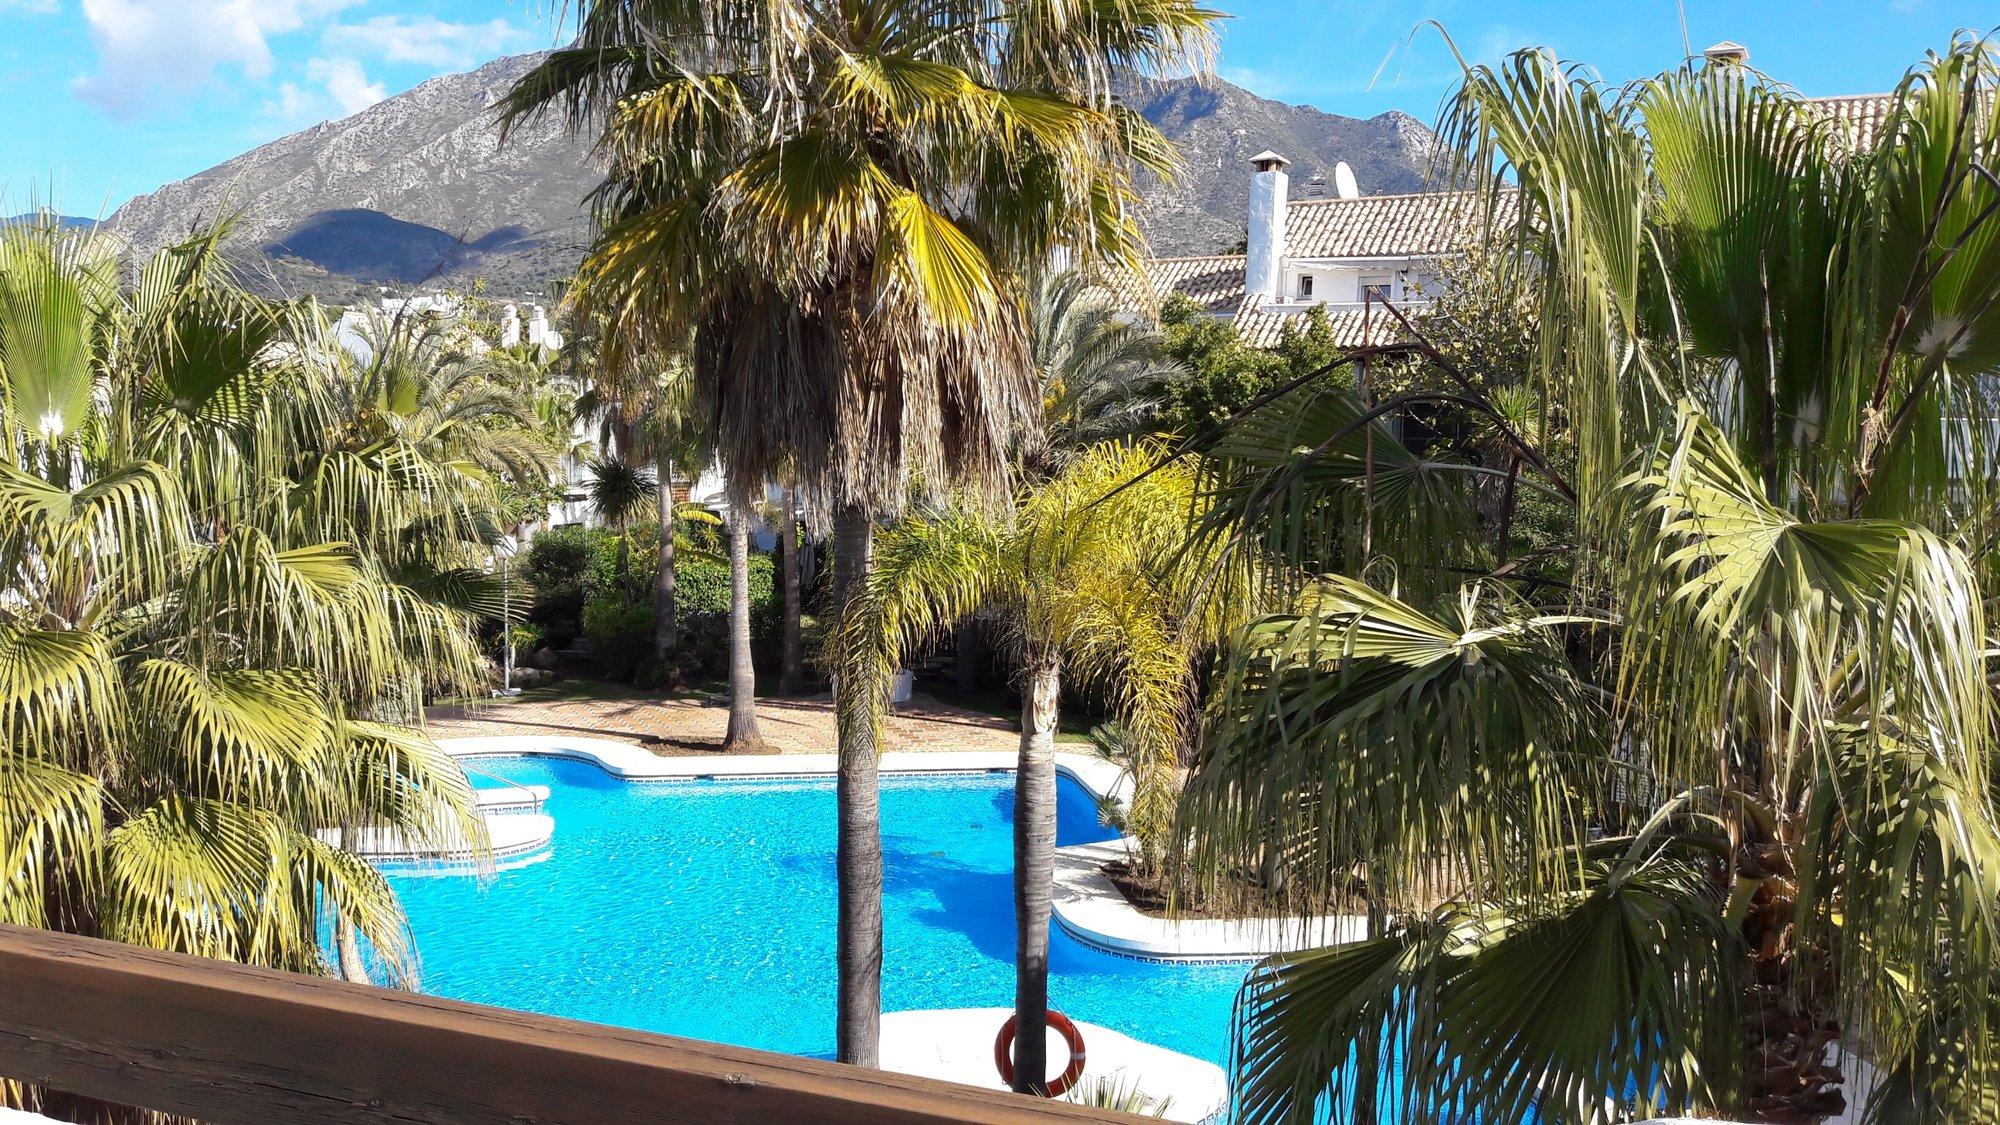 aaa3 bedroom Townhouse in Marbella Golden Mile, Marbella | M171016